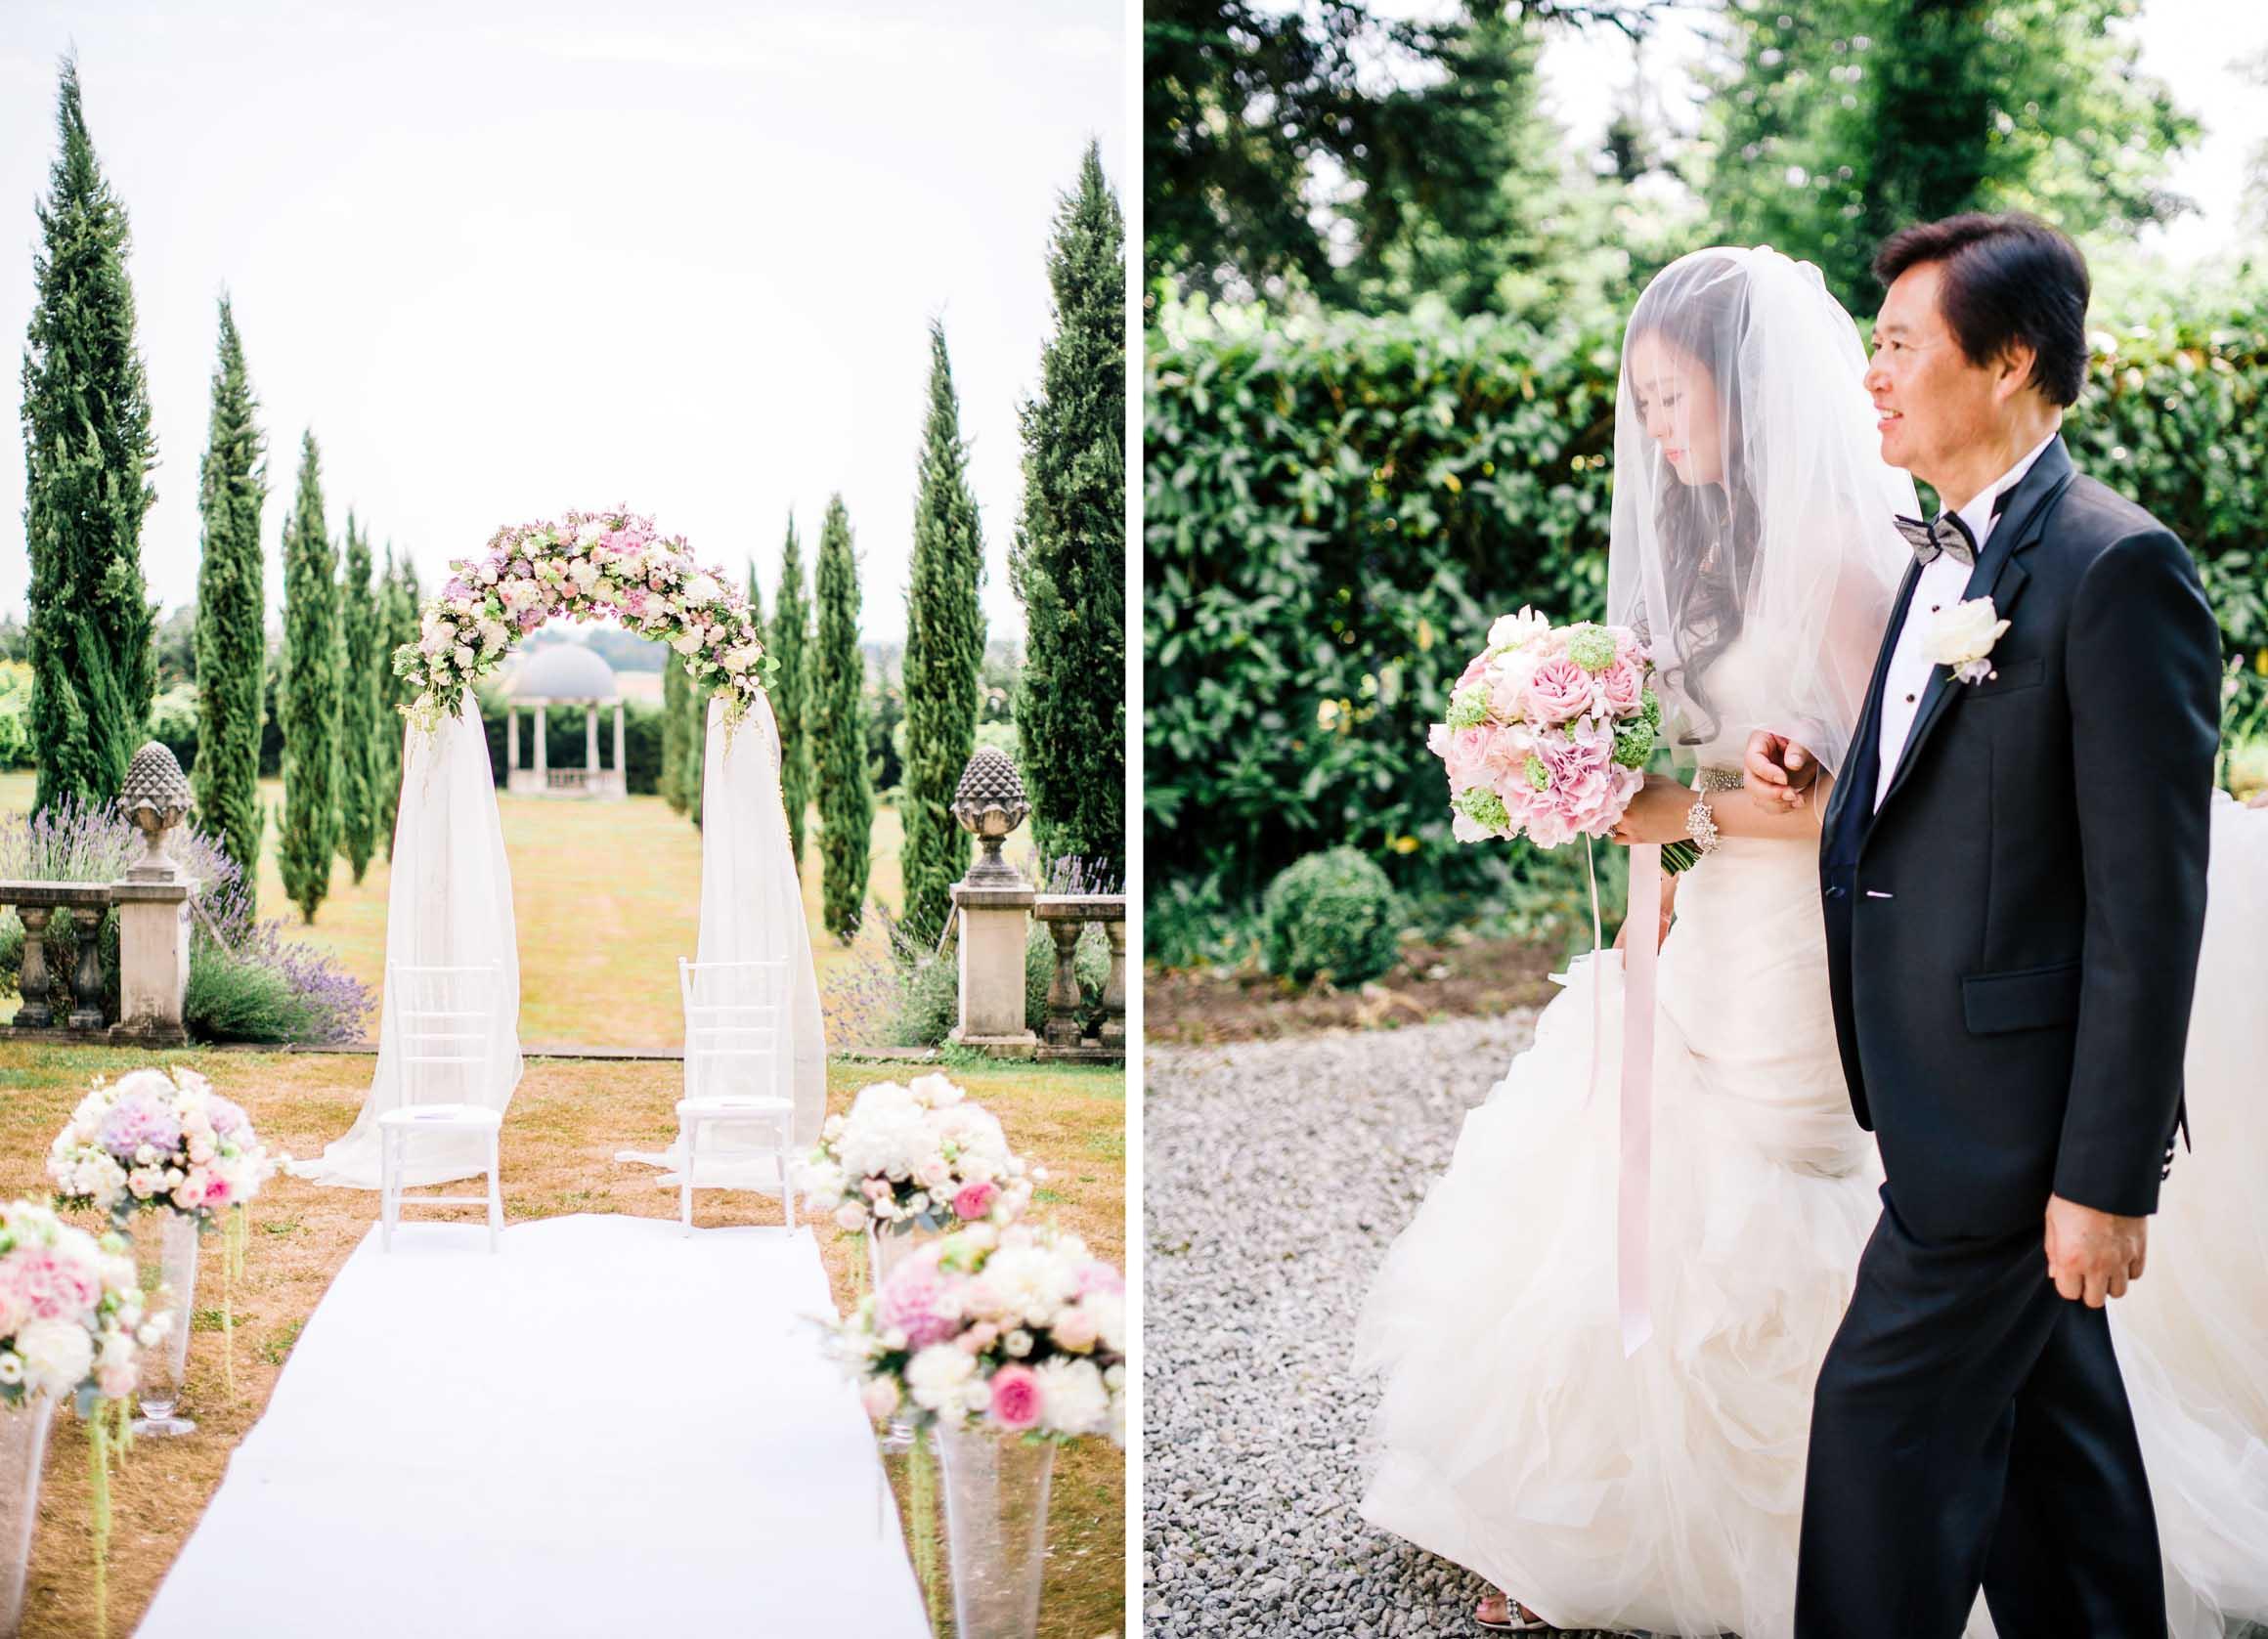 Amy O'Boyle Photography- Destination & UK Fine Art Film Wedding Photographer- Chateau La Durantie Wedding 16.jpg